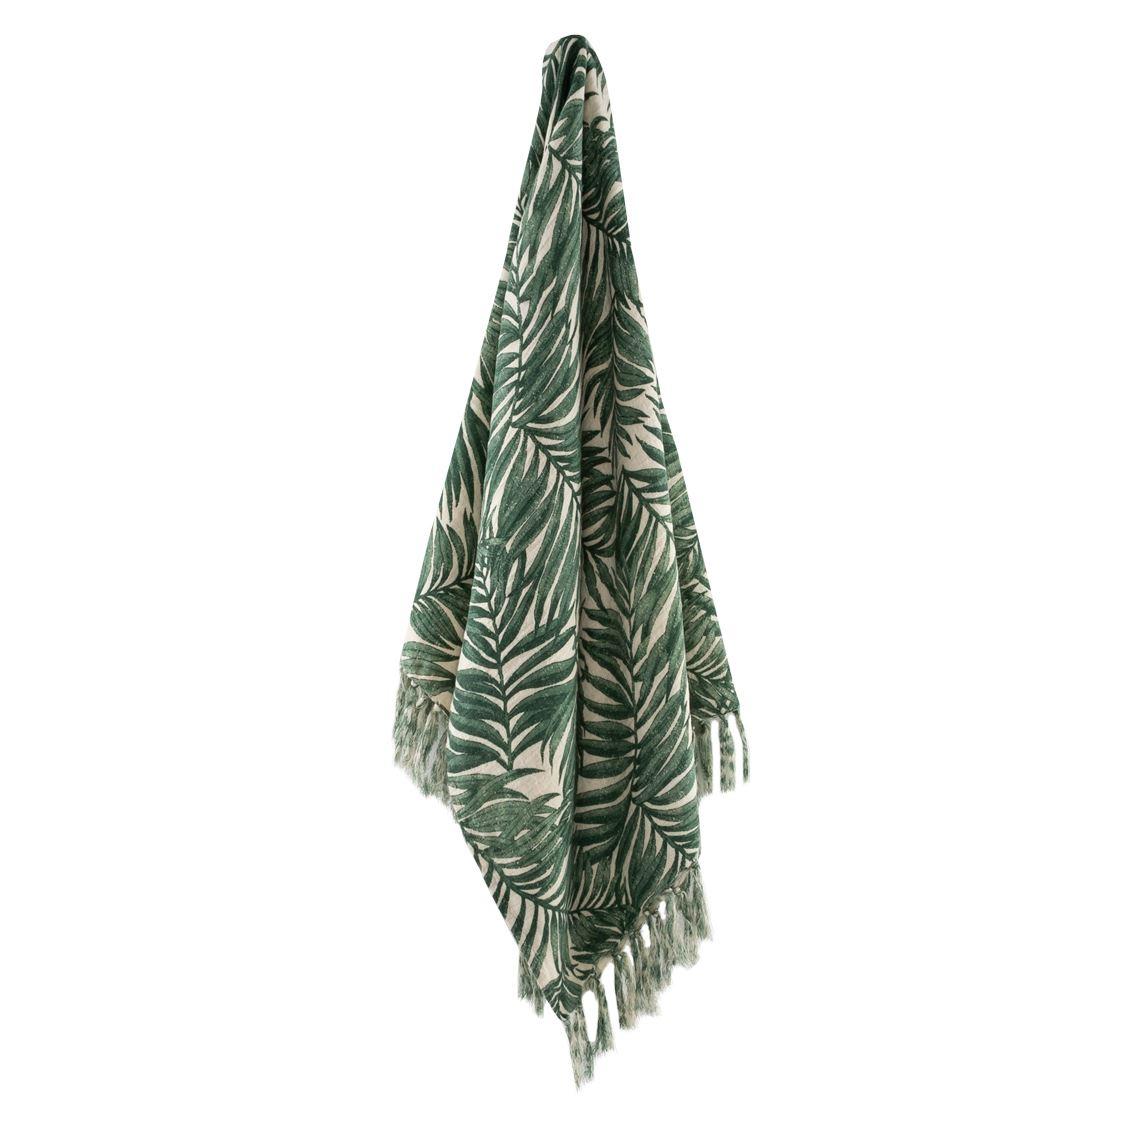 Sendia Throw Size W 130cm x D 1cm x H 150cm in Green Freedom